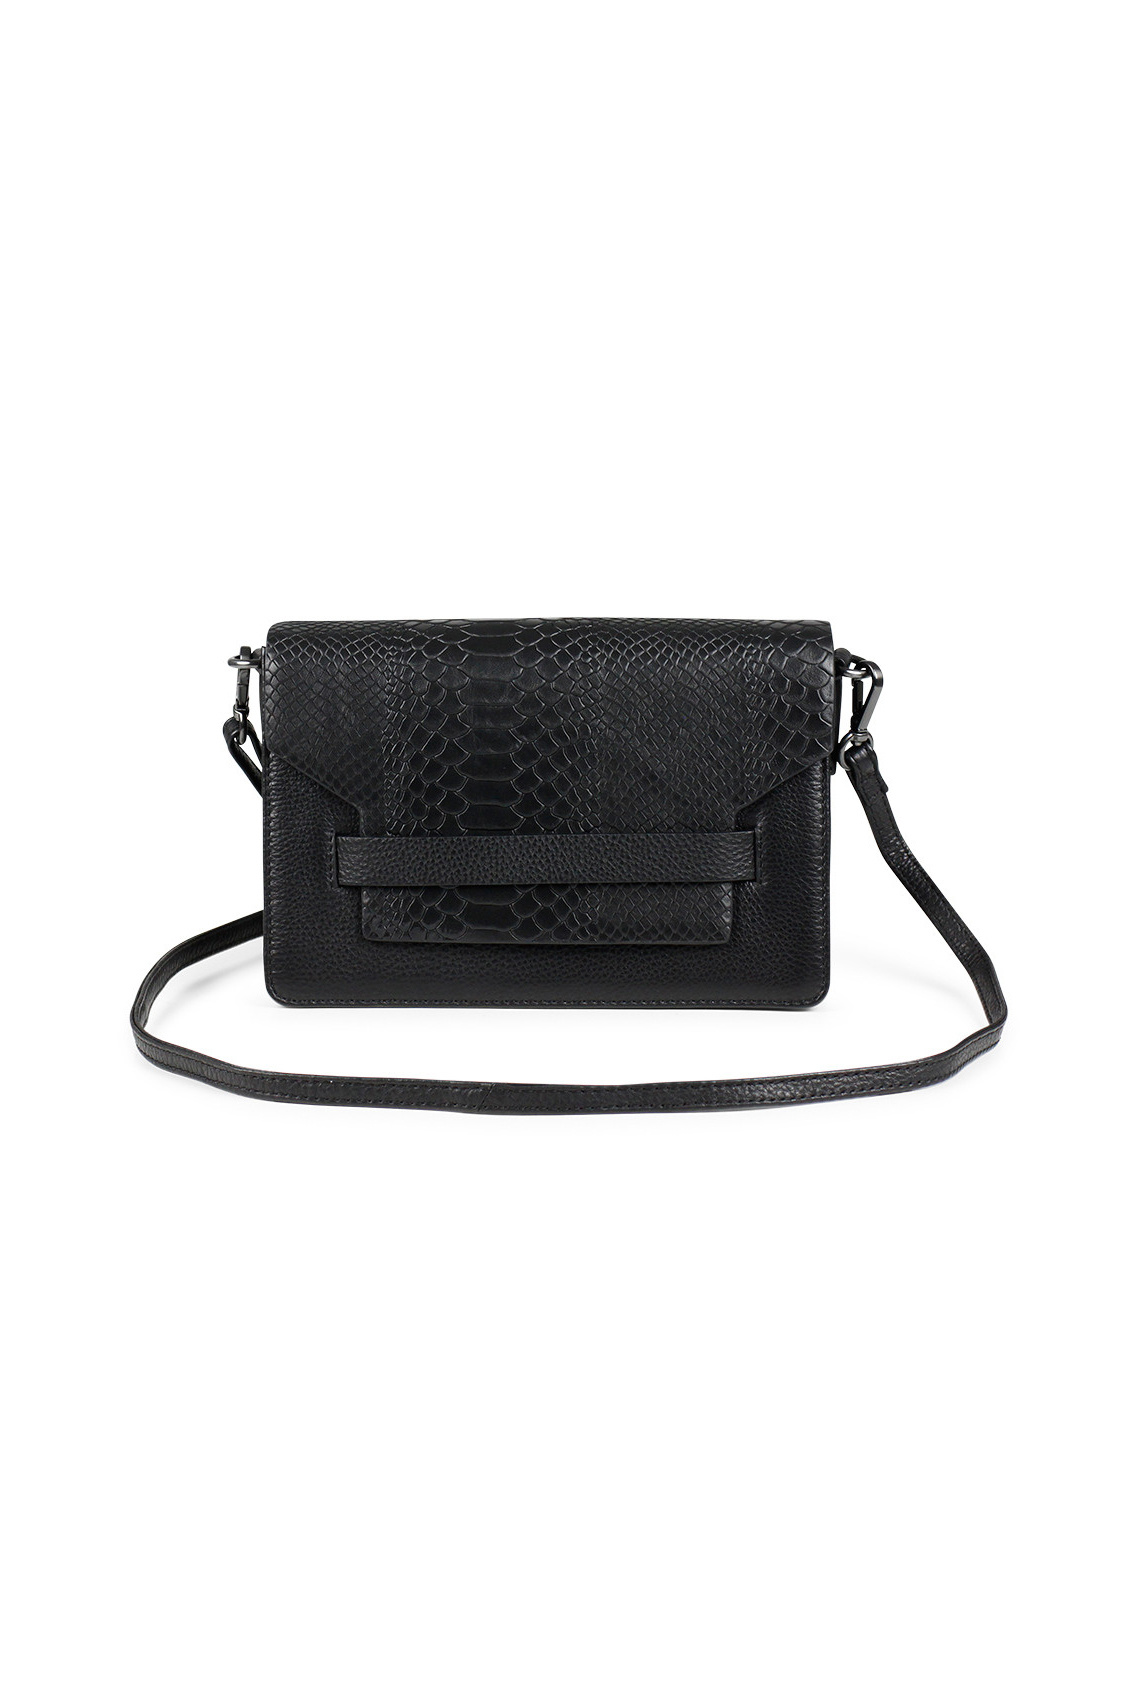 Arabella Crossbody Bag Snake - Black w/ Black-1